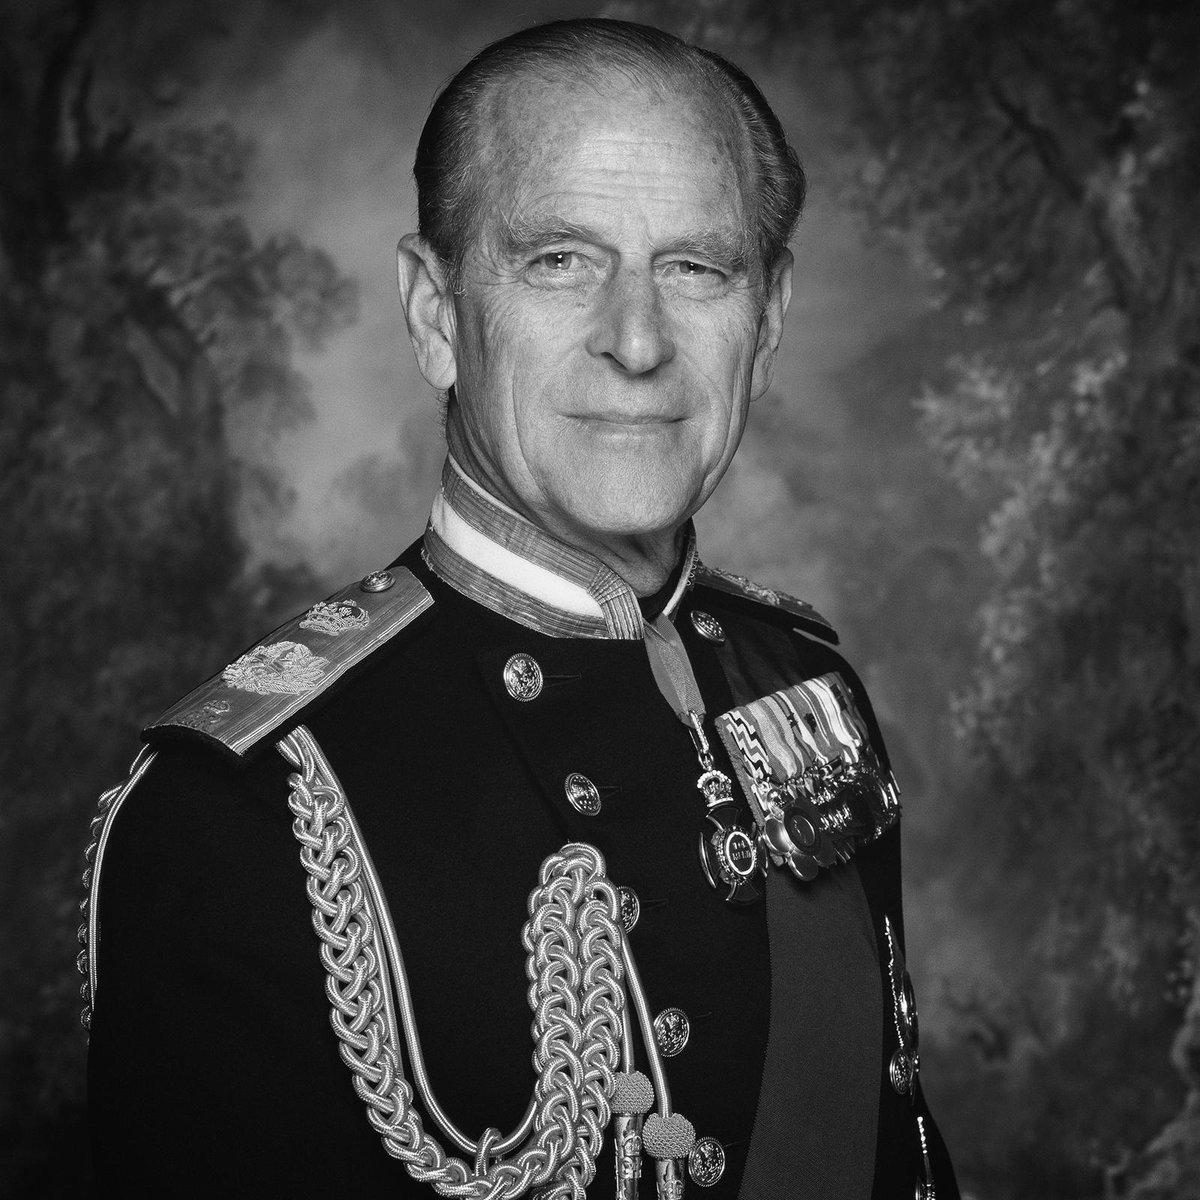 The Death of the Duke of Edinburgh